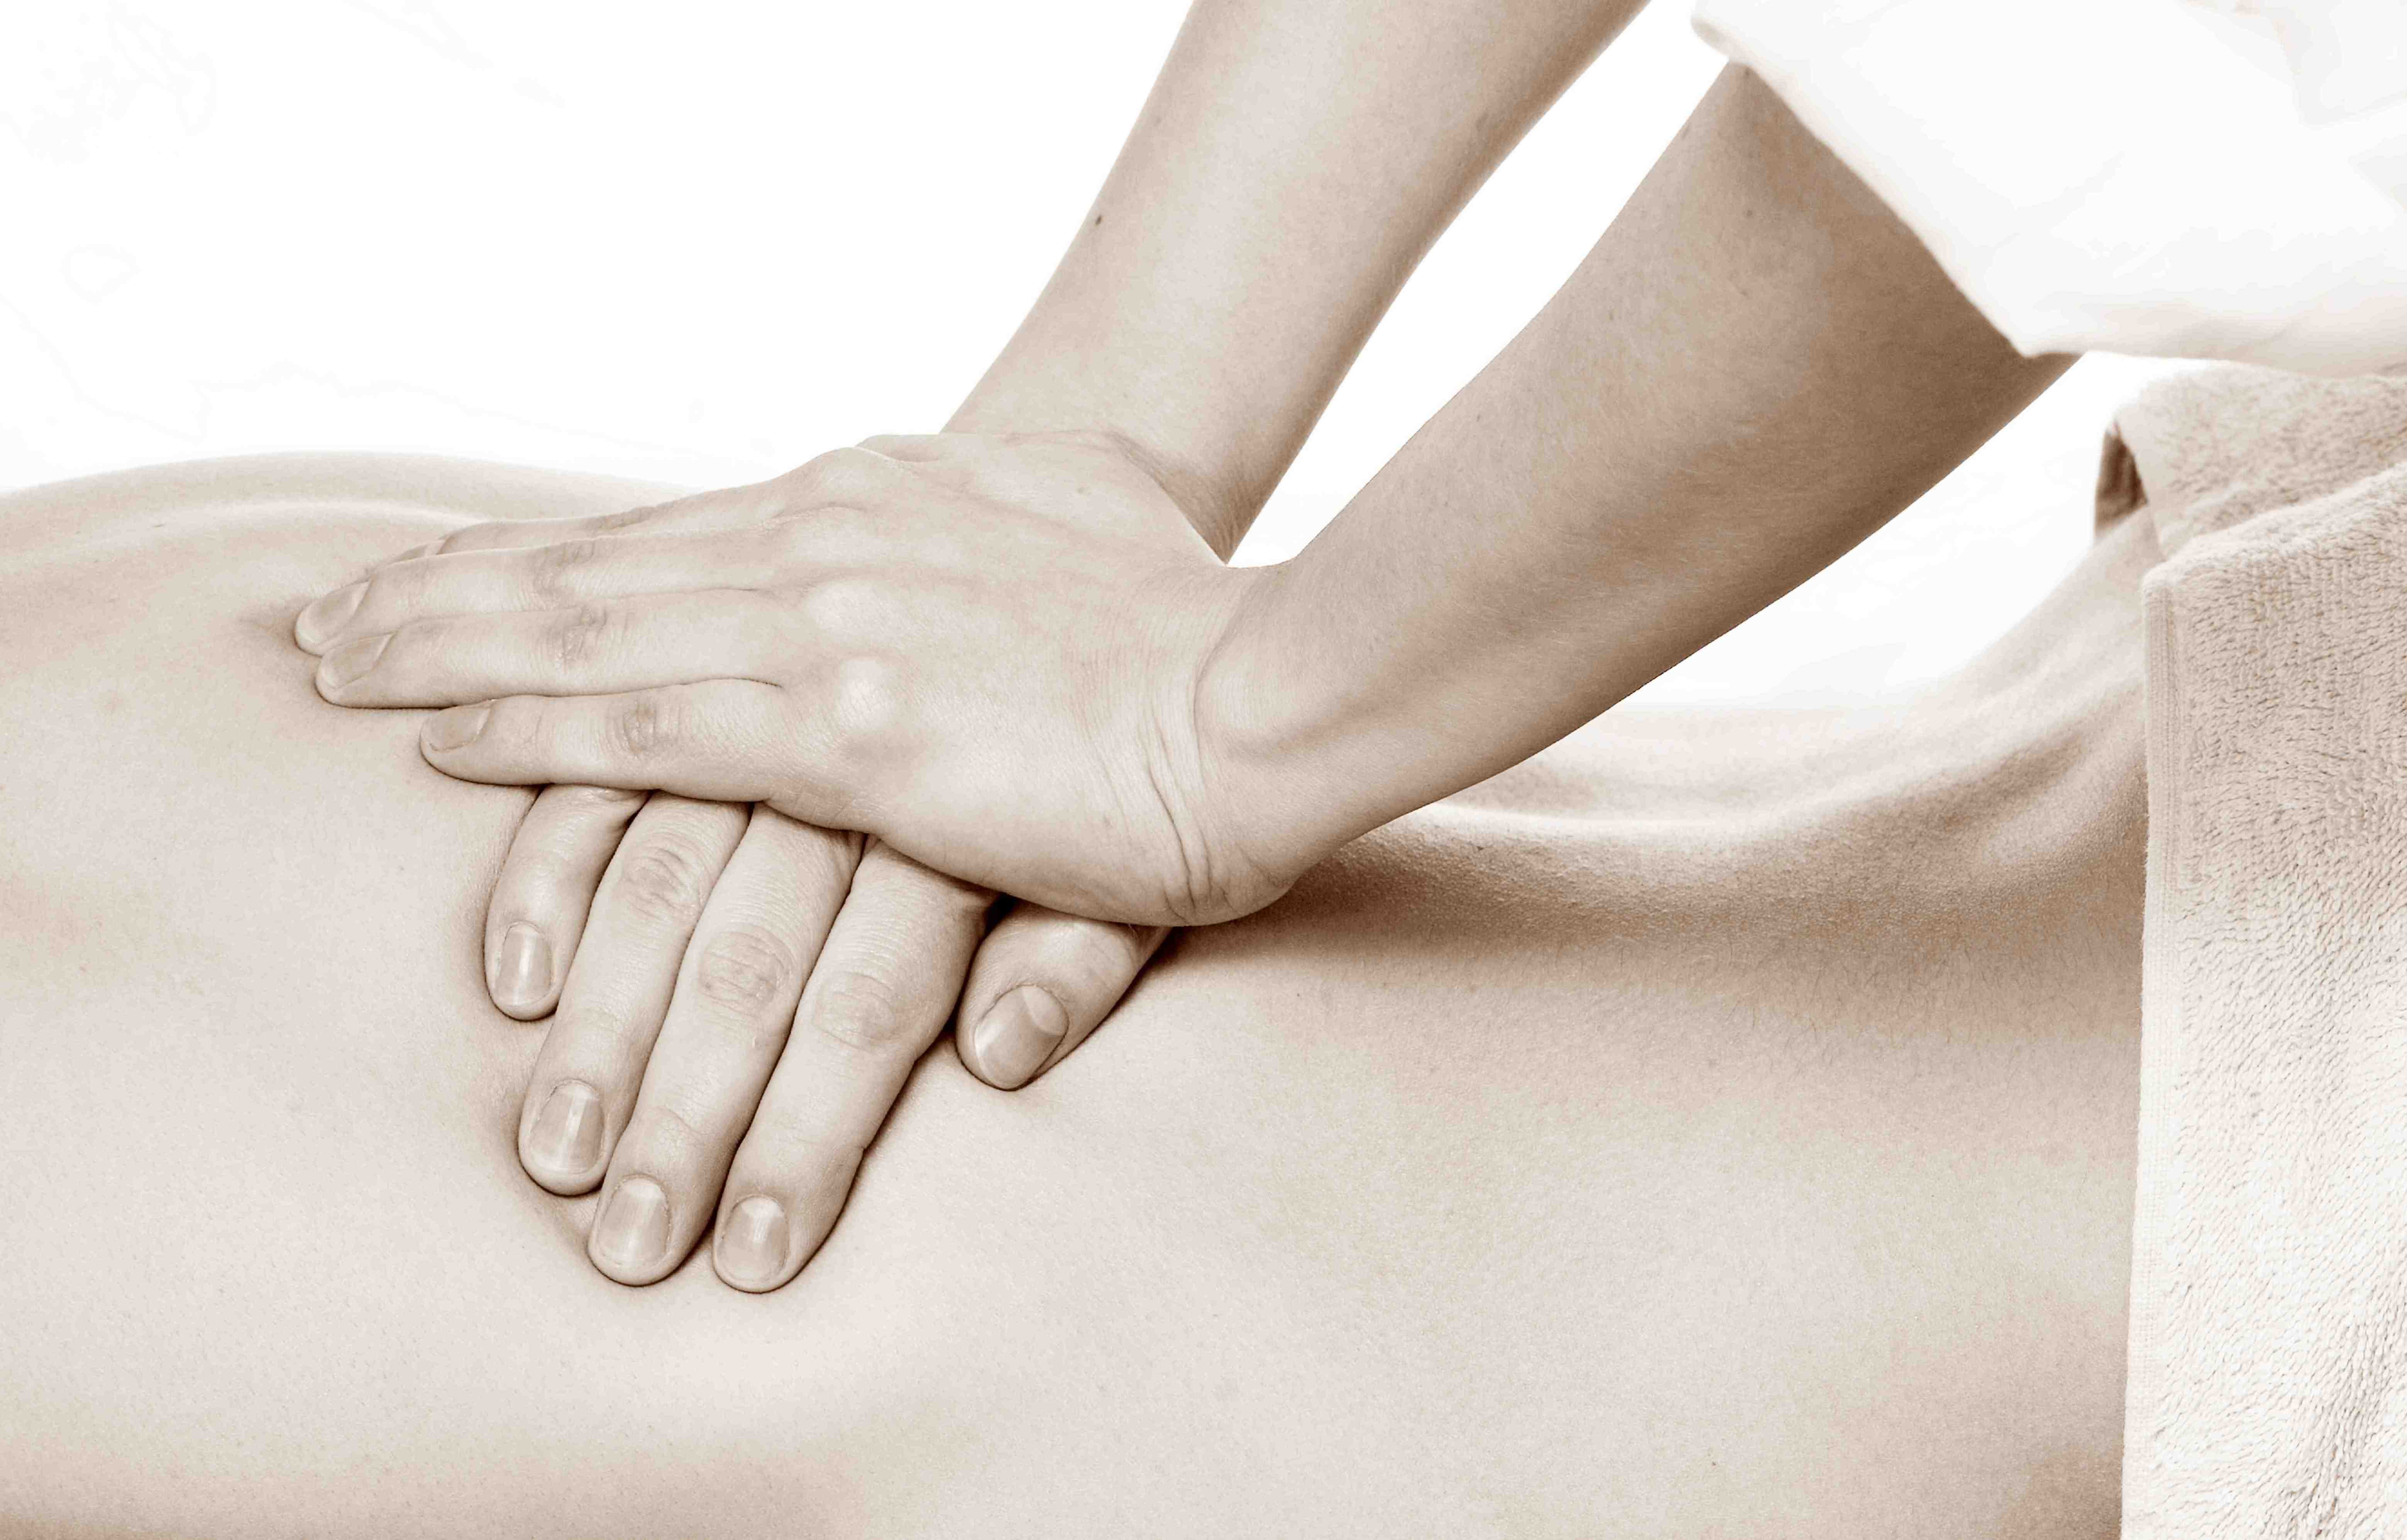 TARIFAS 2021 Osteopatia : Tratamientos & Tarifas de Centro de Recuperación Física Lotería 2 Casco Viejo